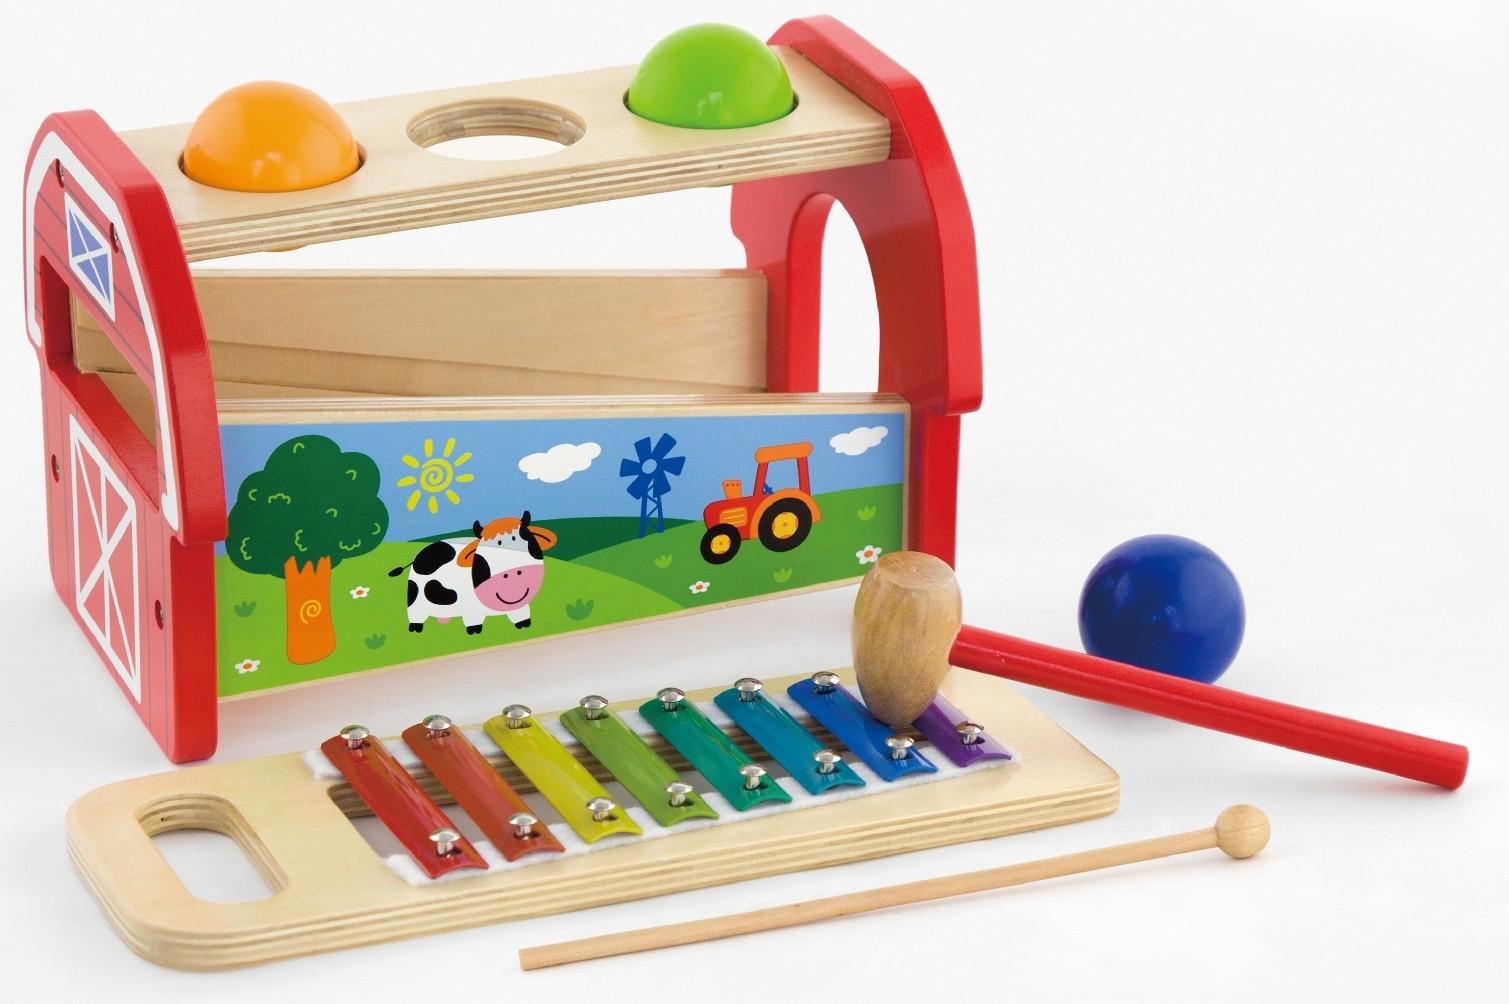 Детски ксилофон с чукче и топки от Viga toys - бебешка играчка - детски музикални инструменти(1)-bellamie